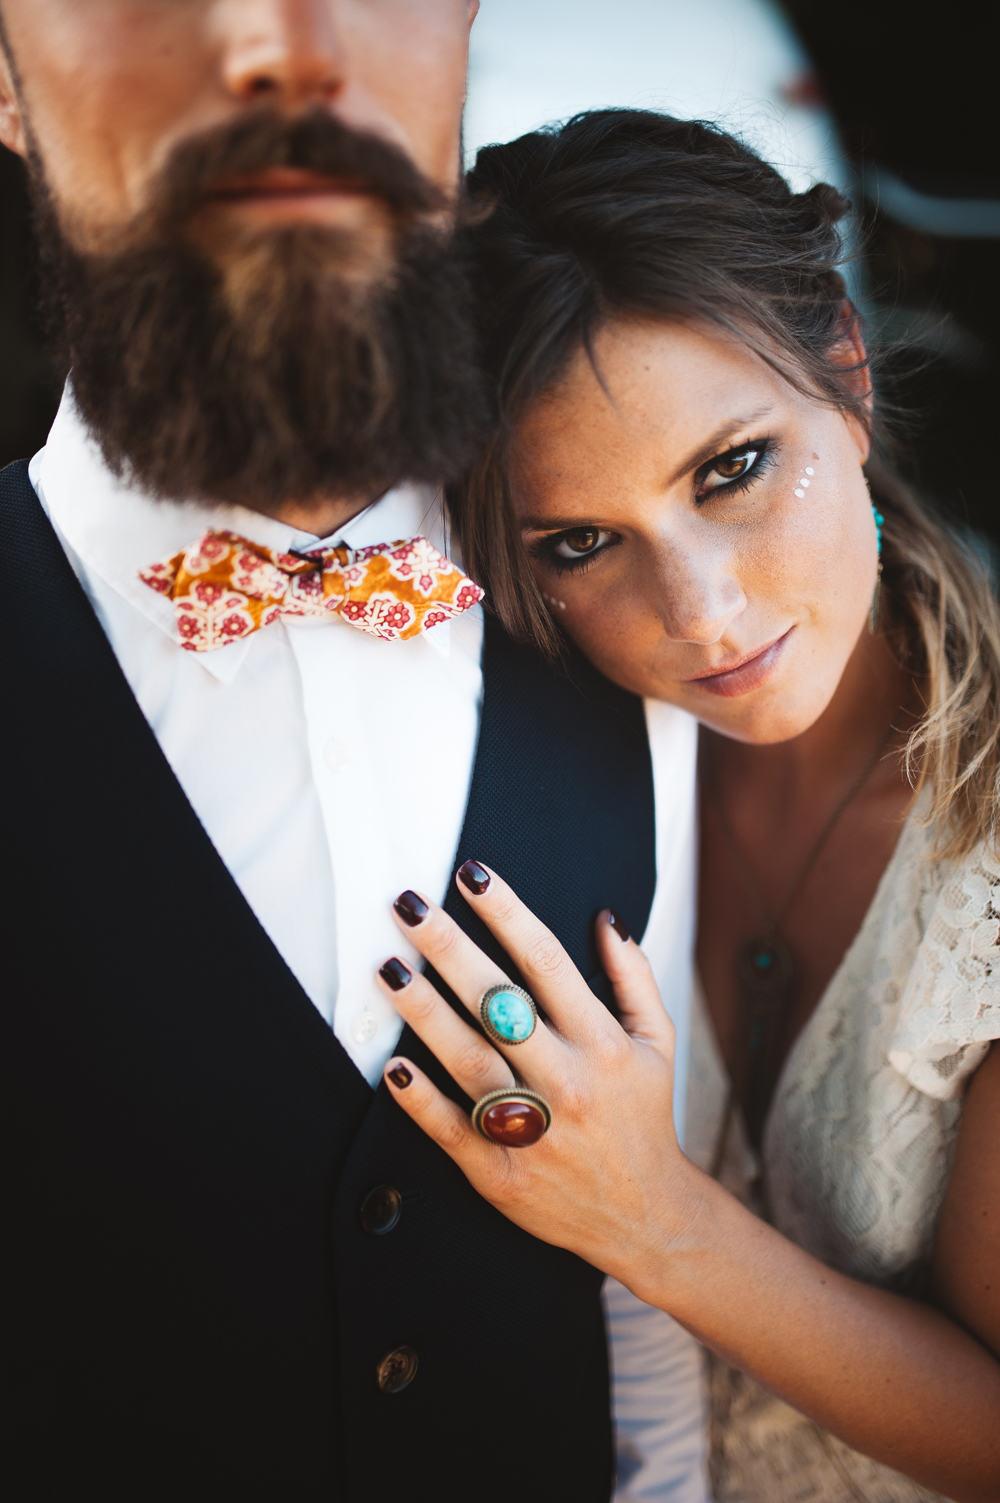 melanie-bultez-photographe-mariage-provence-wedding-photographer-aix-montpellier-folk-ethnique-55